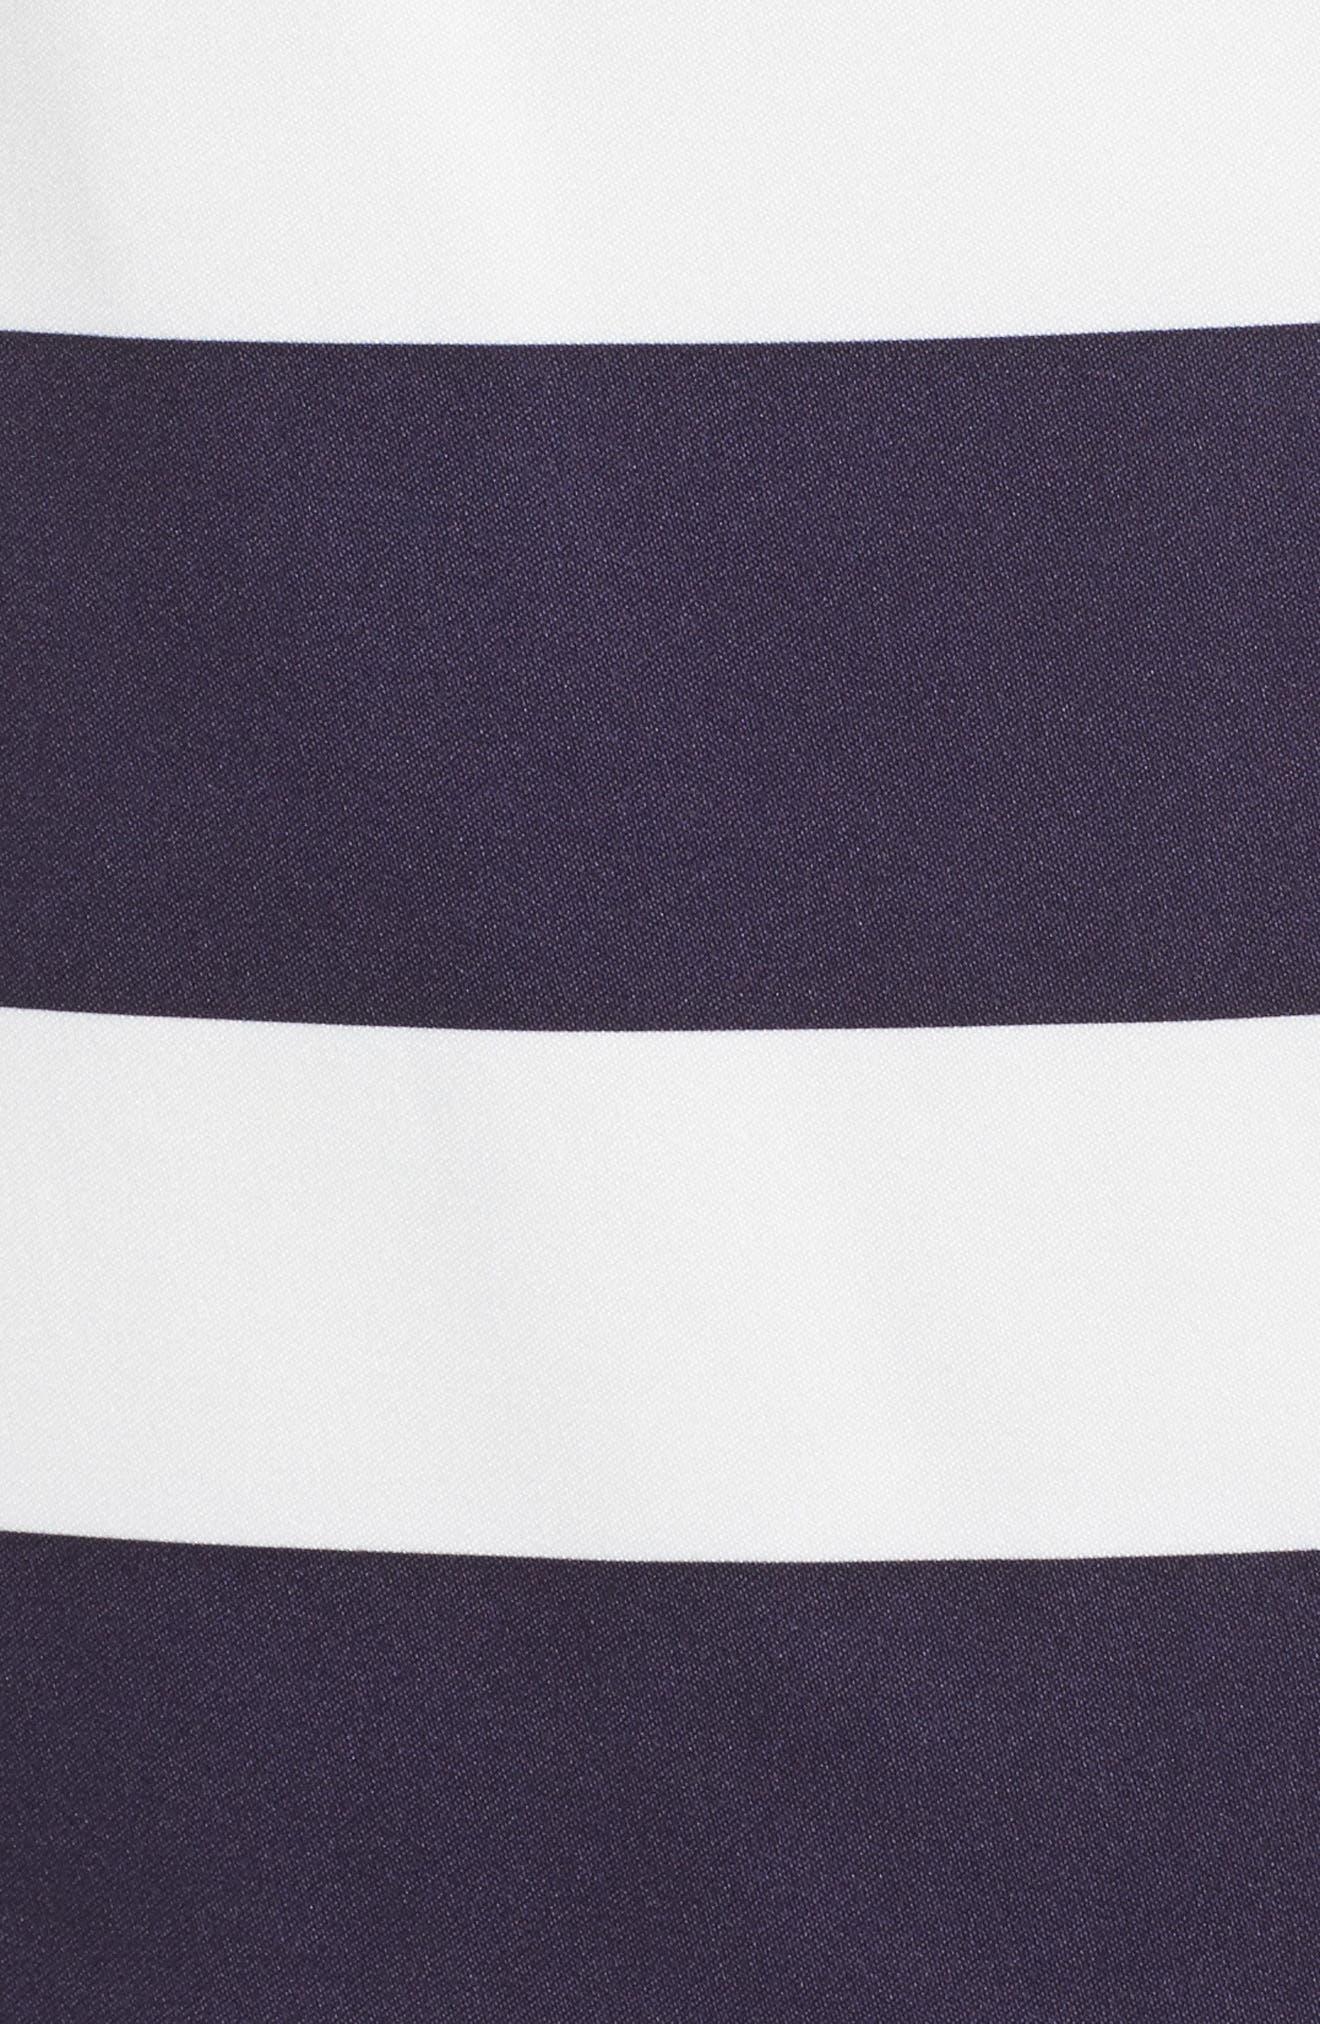 Embellished Mikado Dress,                             Alternate thumbnail 6, color,                             407